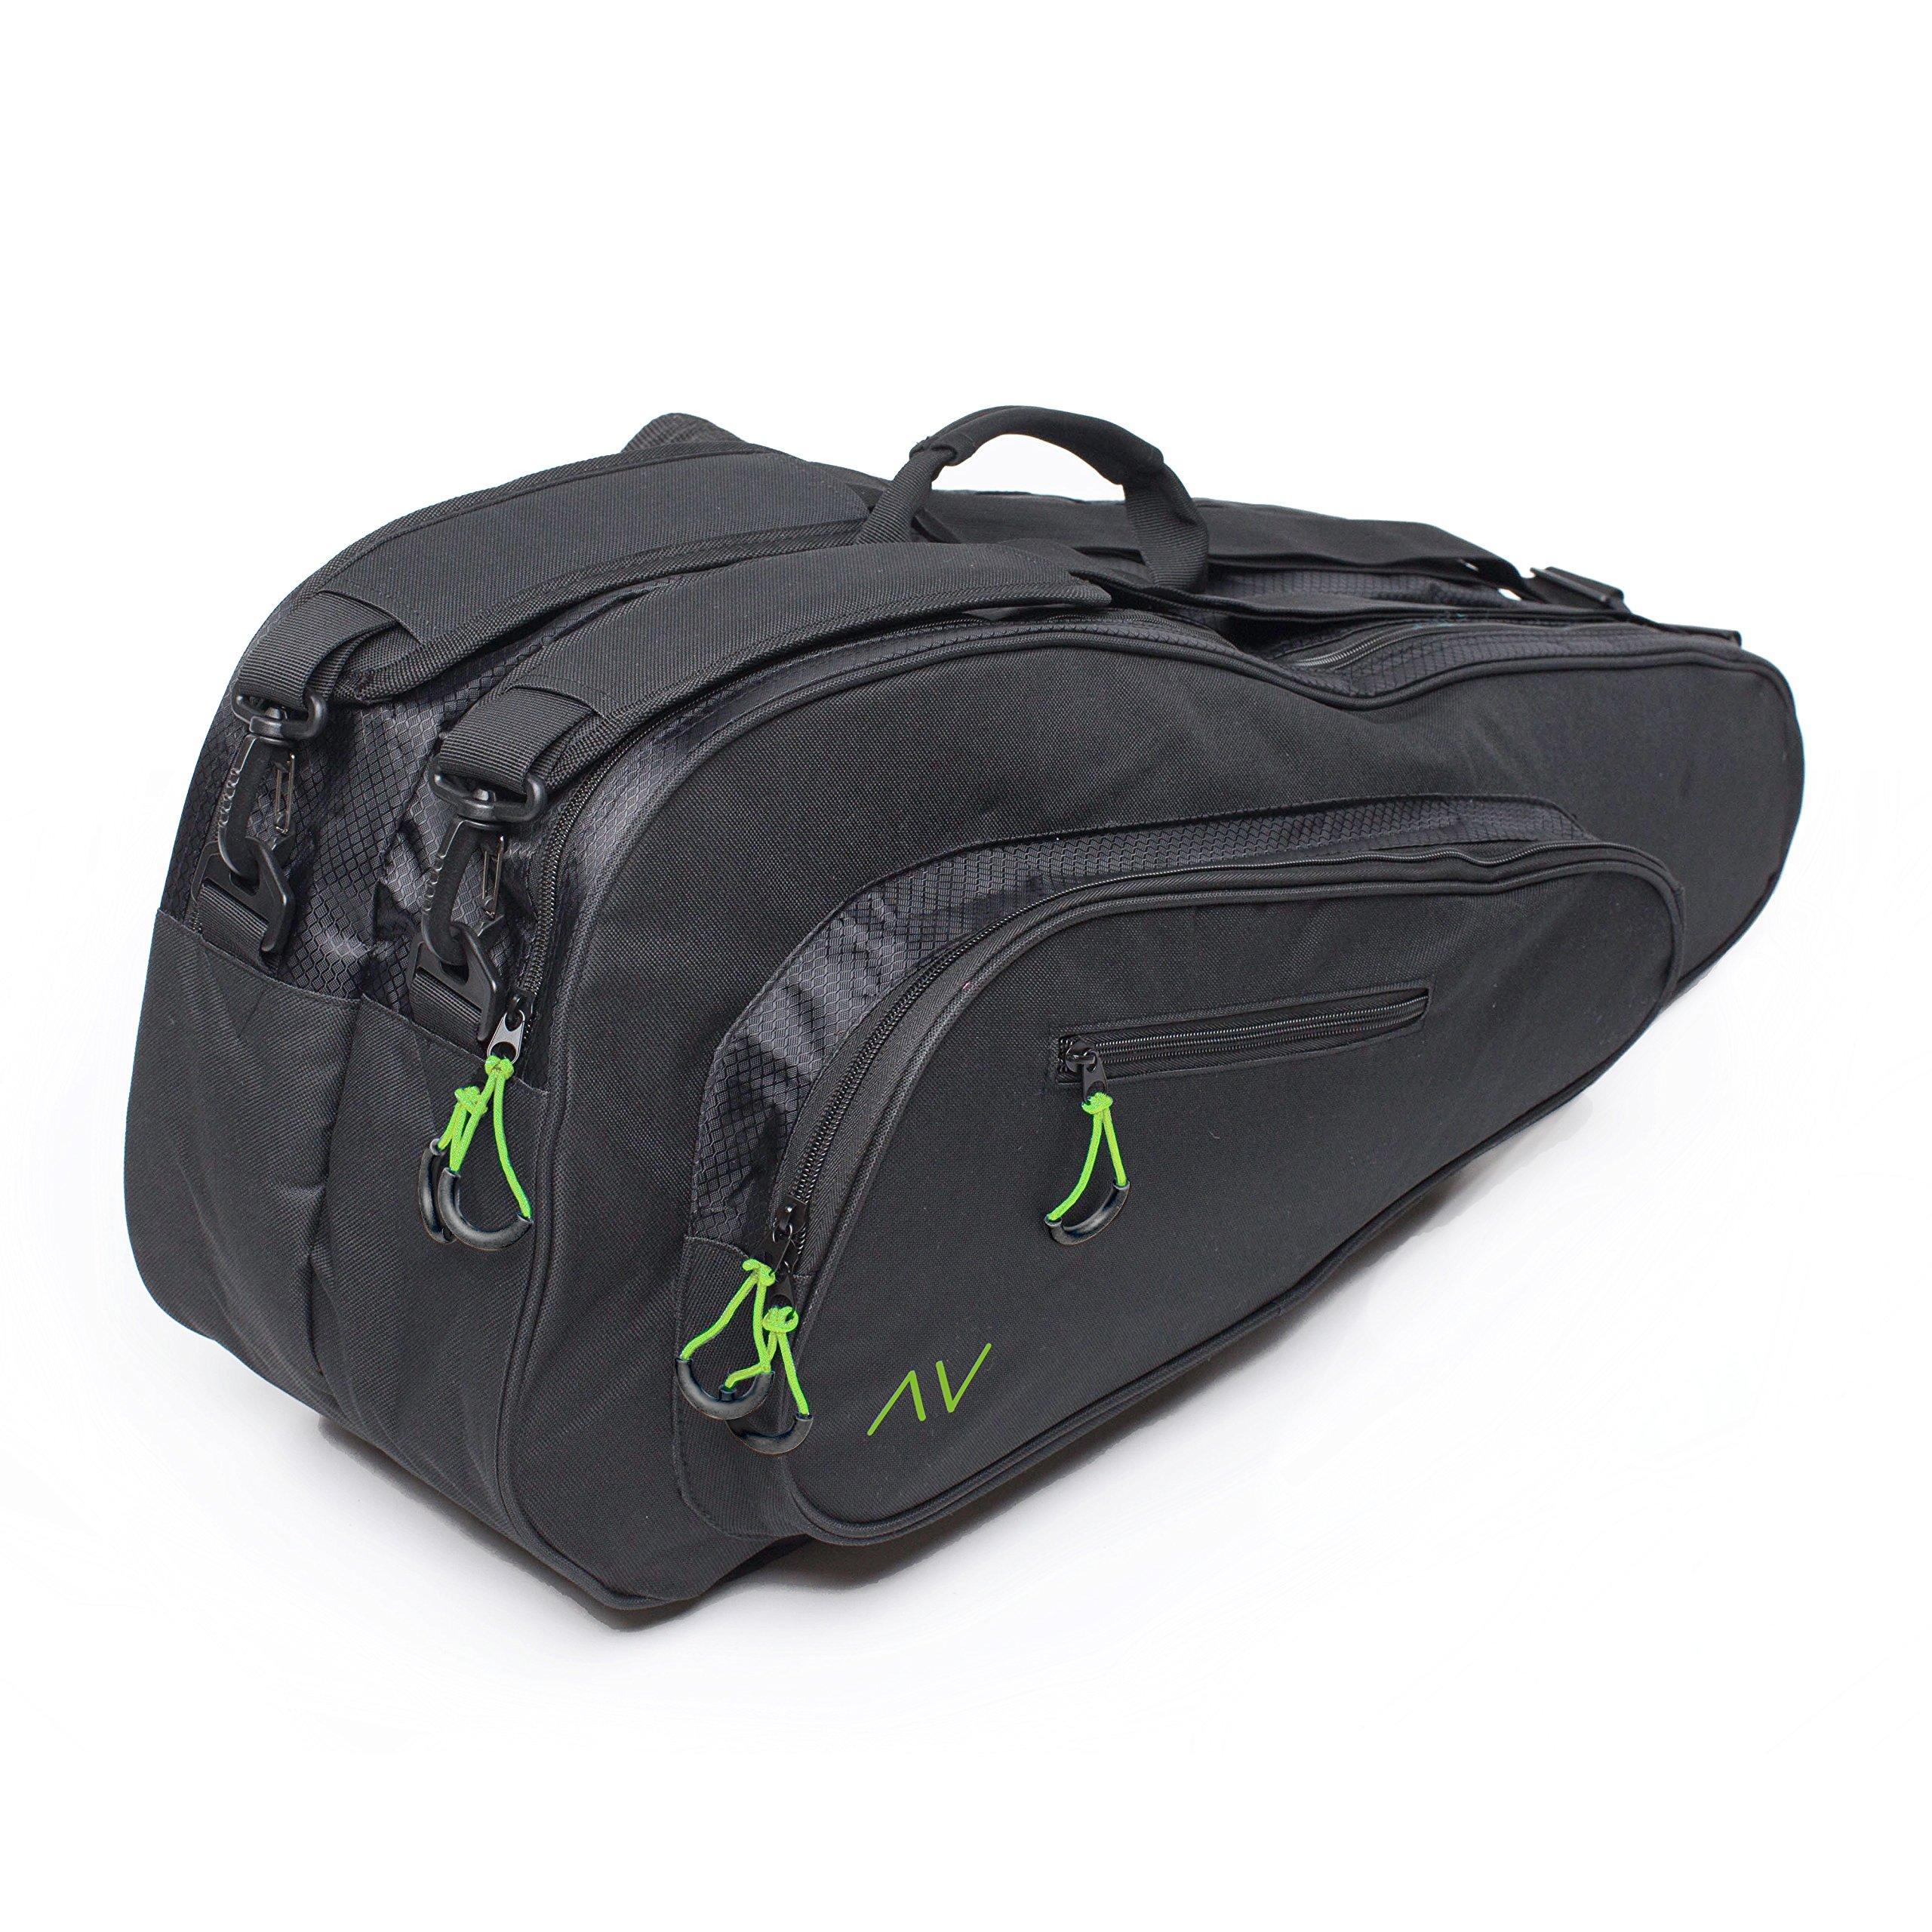 Gigavibe Premium 6R Tennis Bag in Black (Black Neon) 5b15de5b29d45